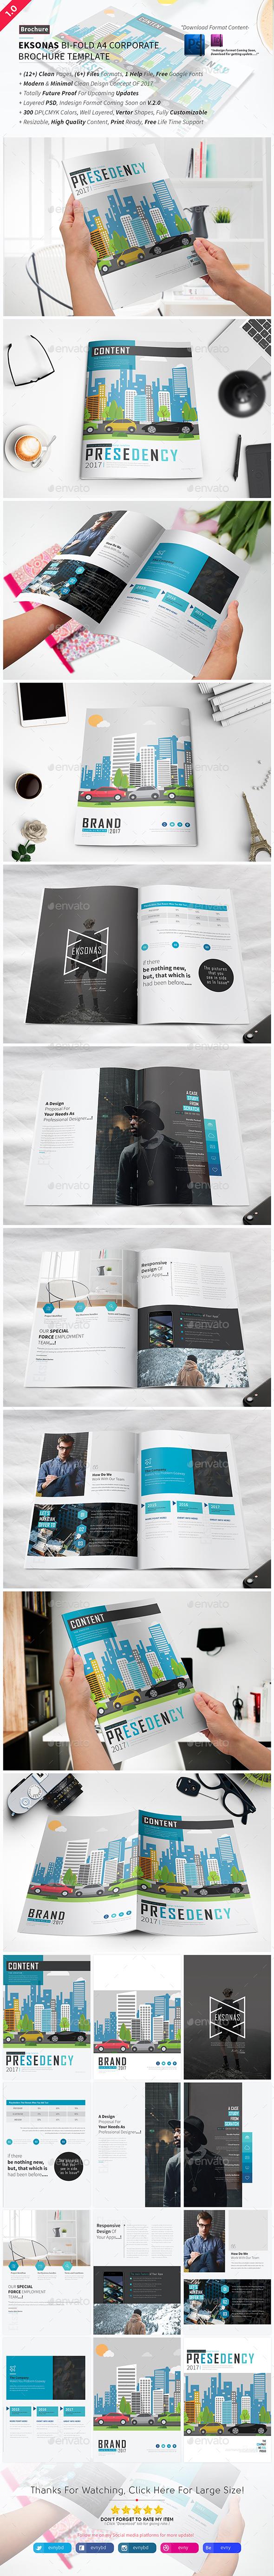 Eksonas Bi-fold Brochure Template - Brochures Print Templates